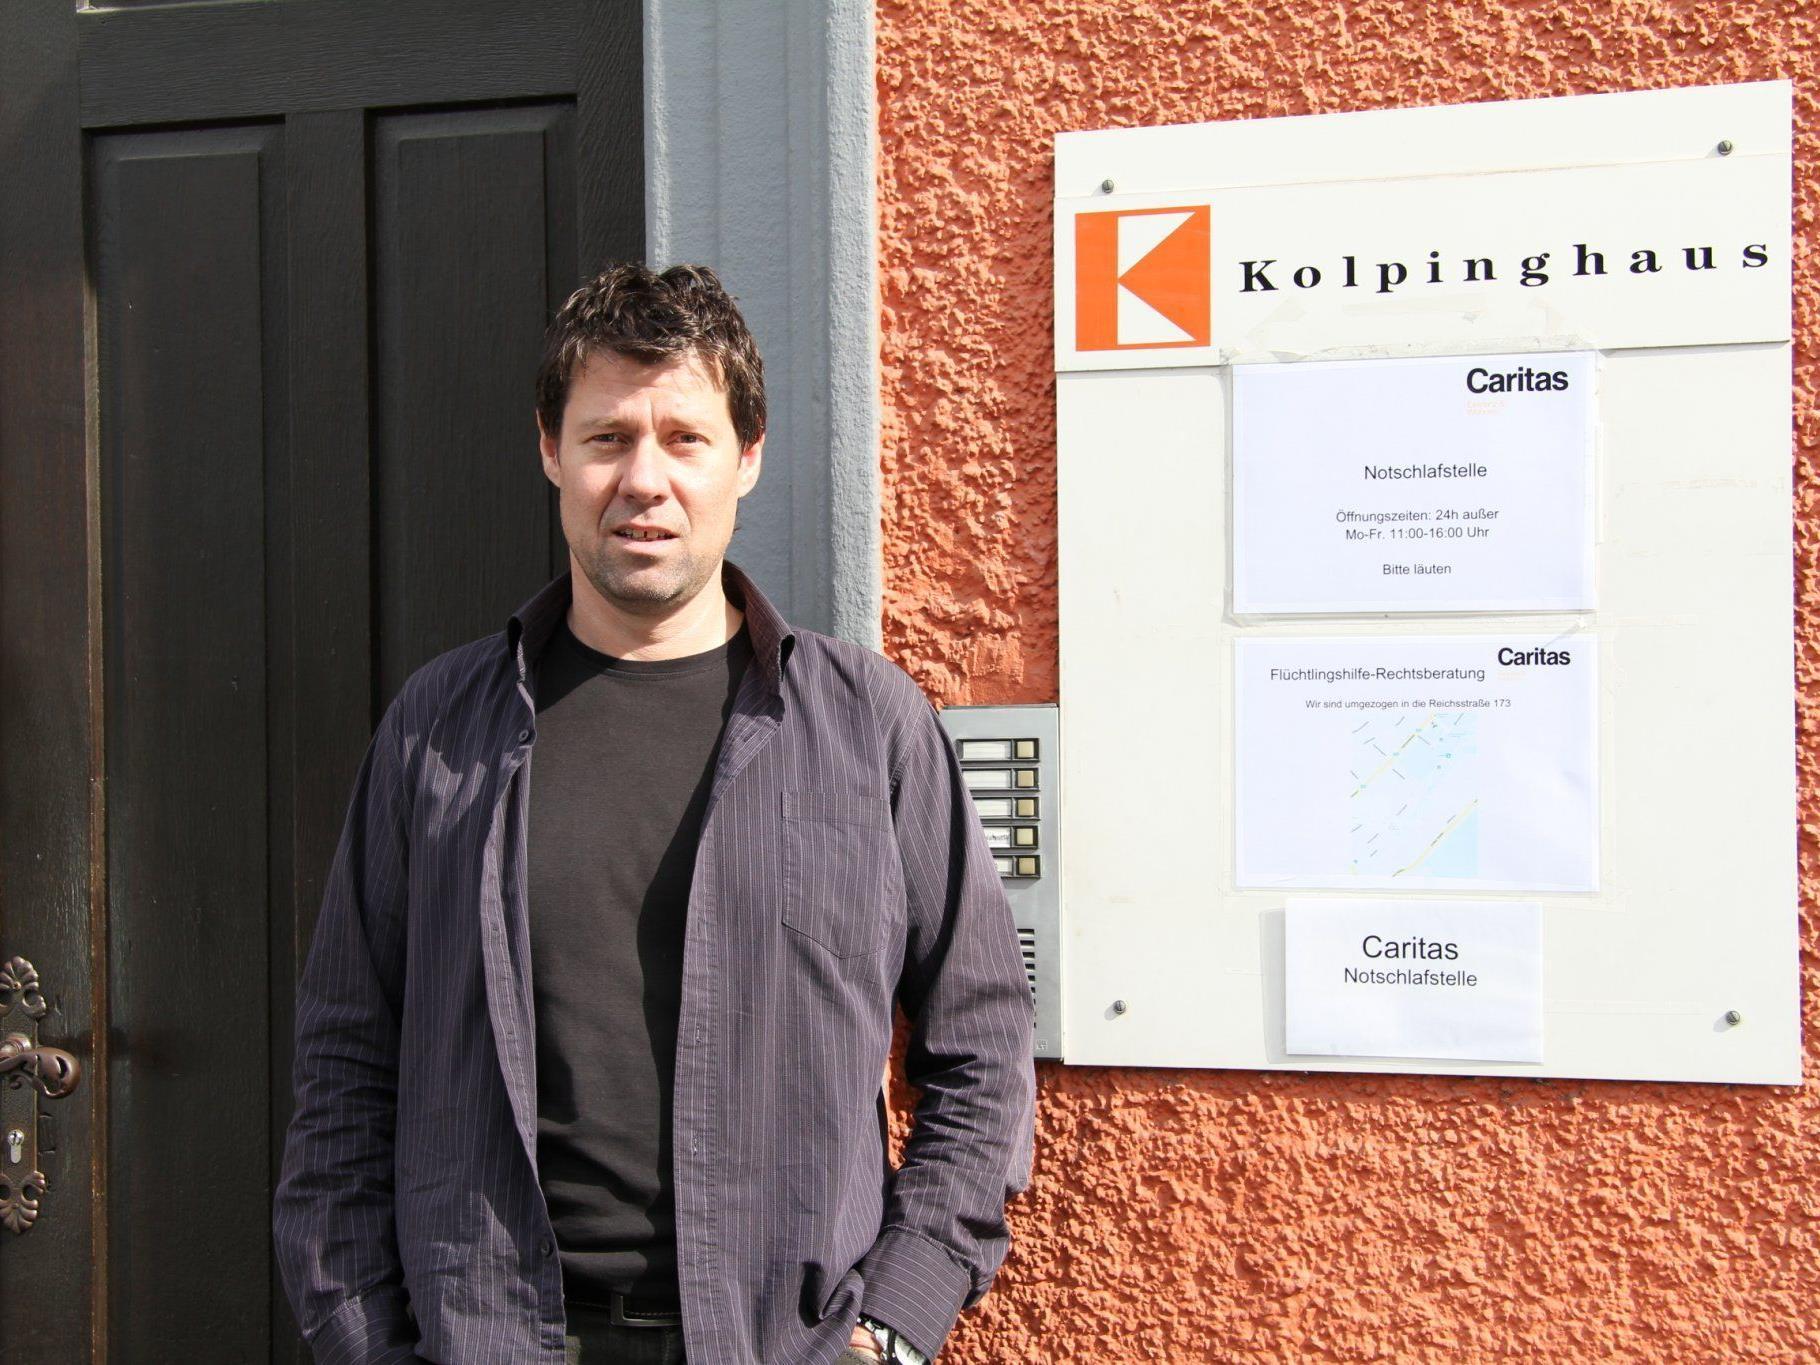 Wolfgang Meier von der Caritas vor dem Kolpinghaus.